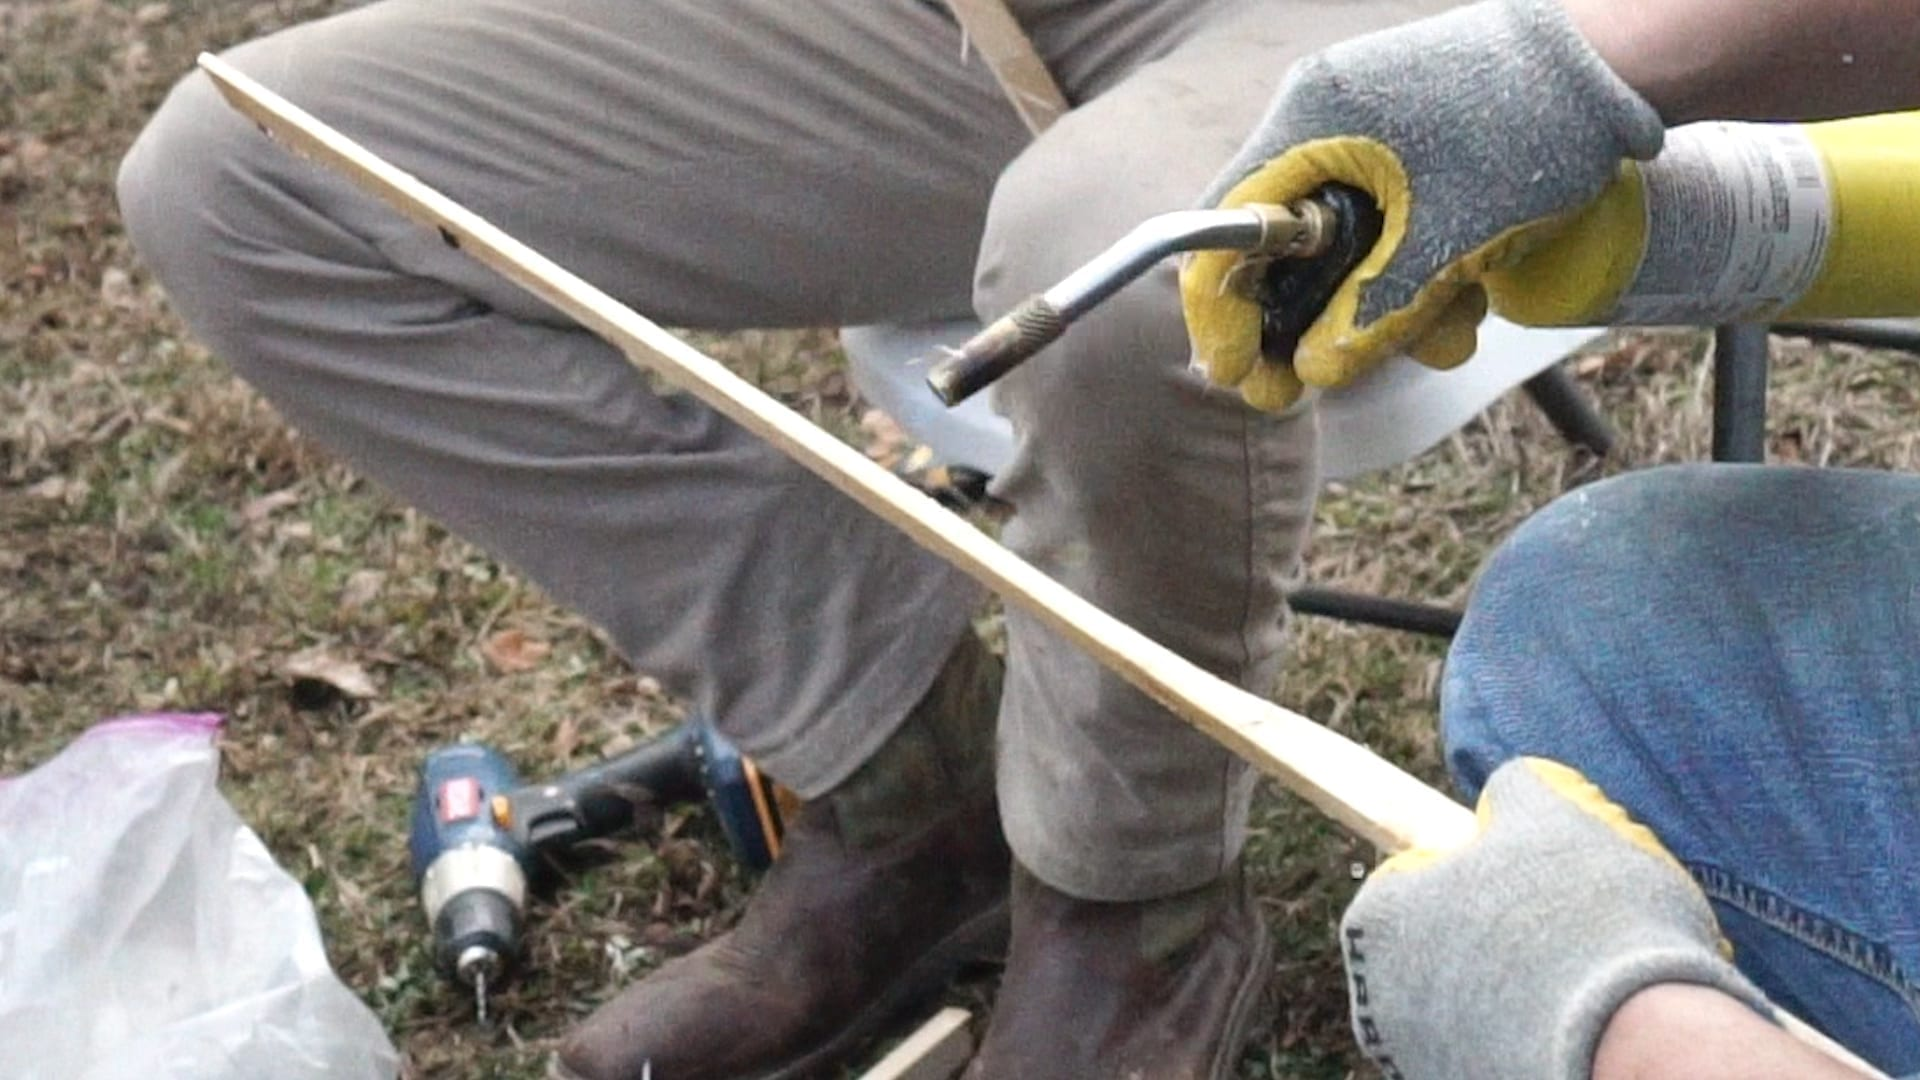 wood lacrosse sticks billy brenner stick maker series justin skaggs